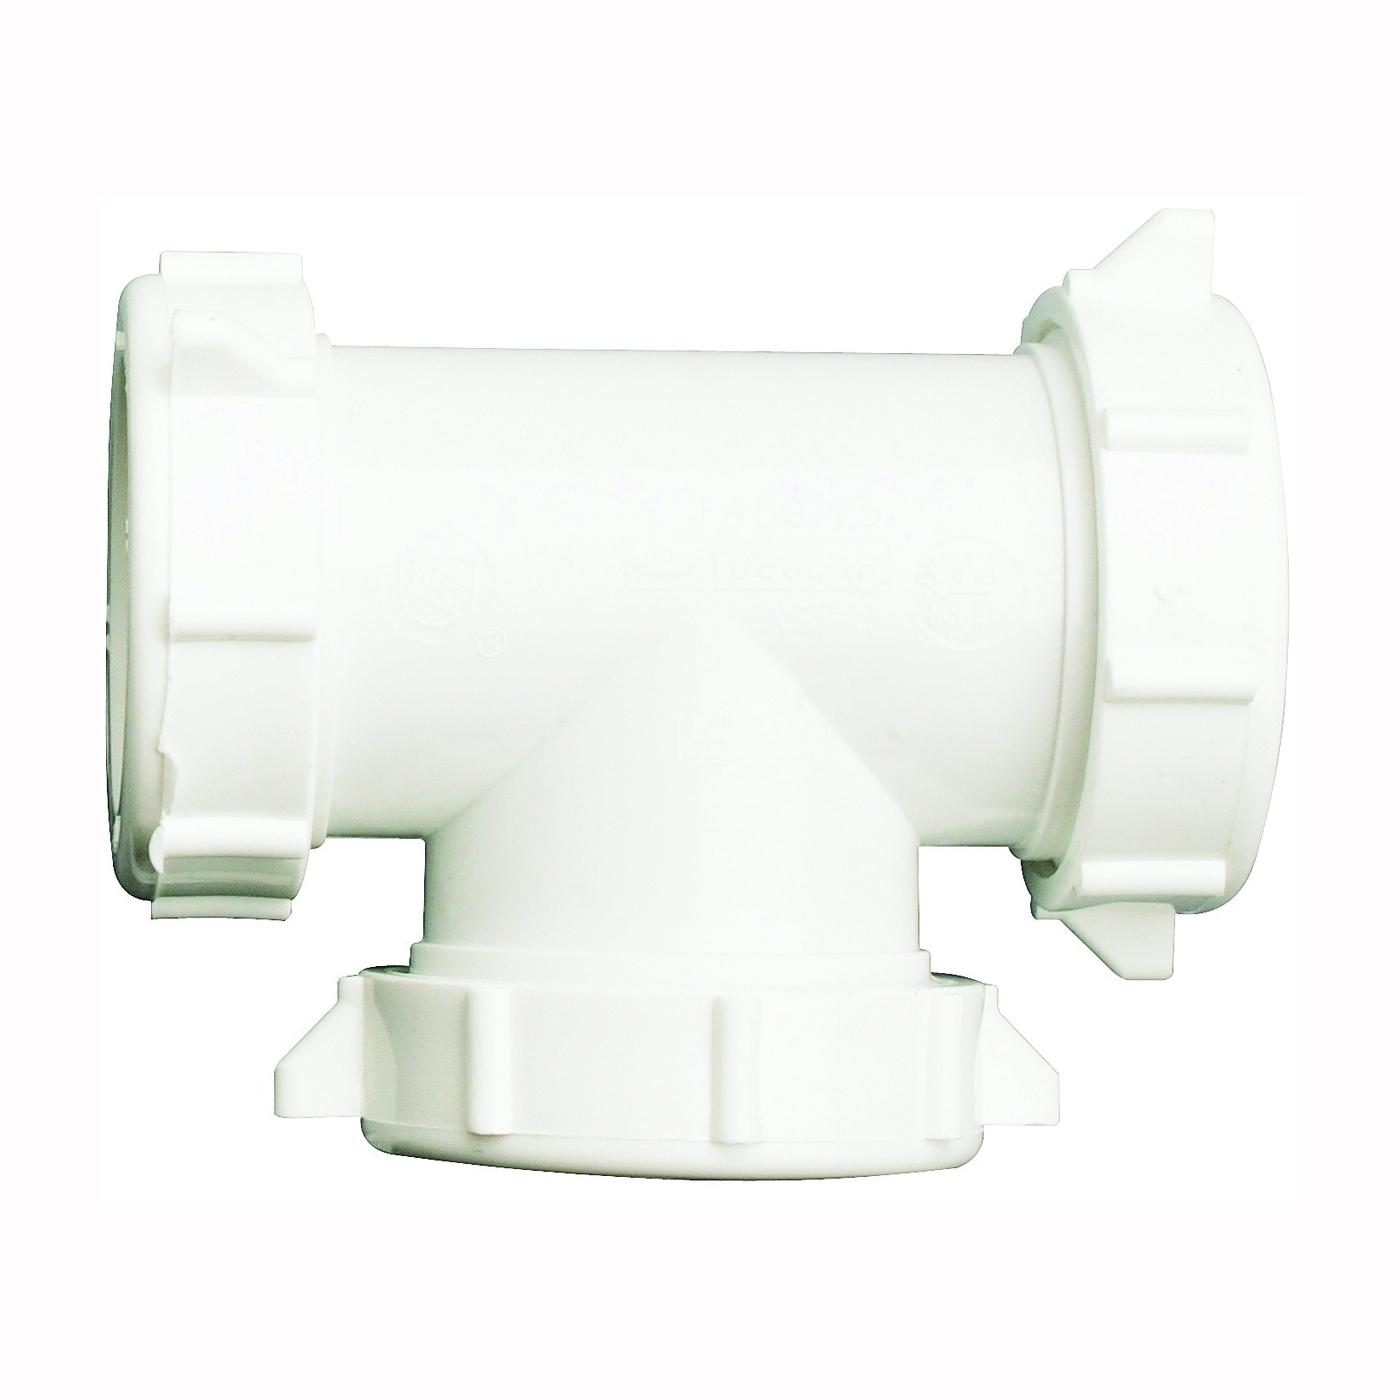 Picture of Plumb Pak PP20556 Coupling Tee, 1-1/2 in, PVC